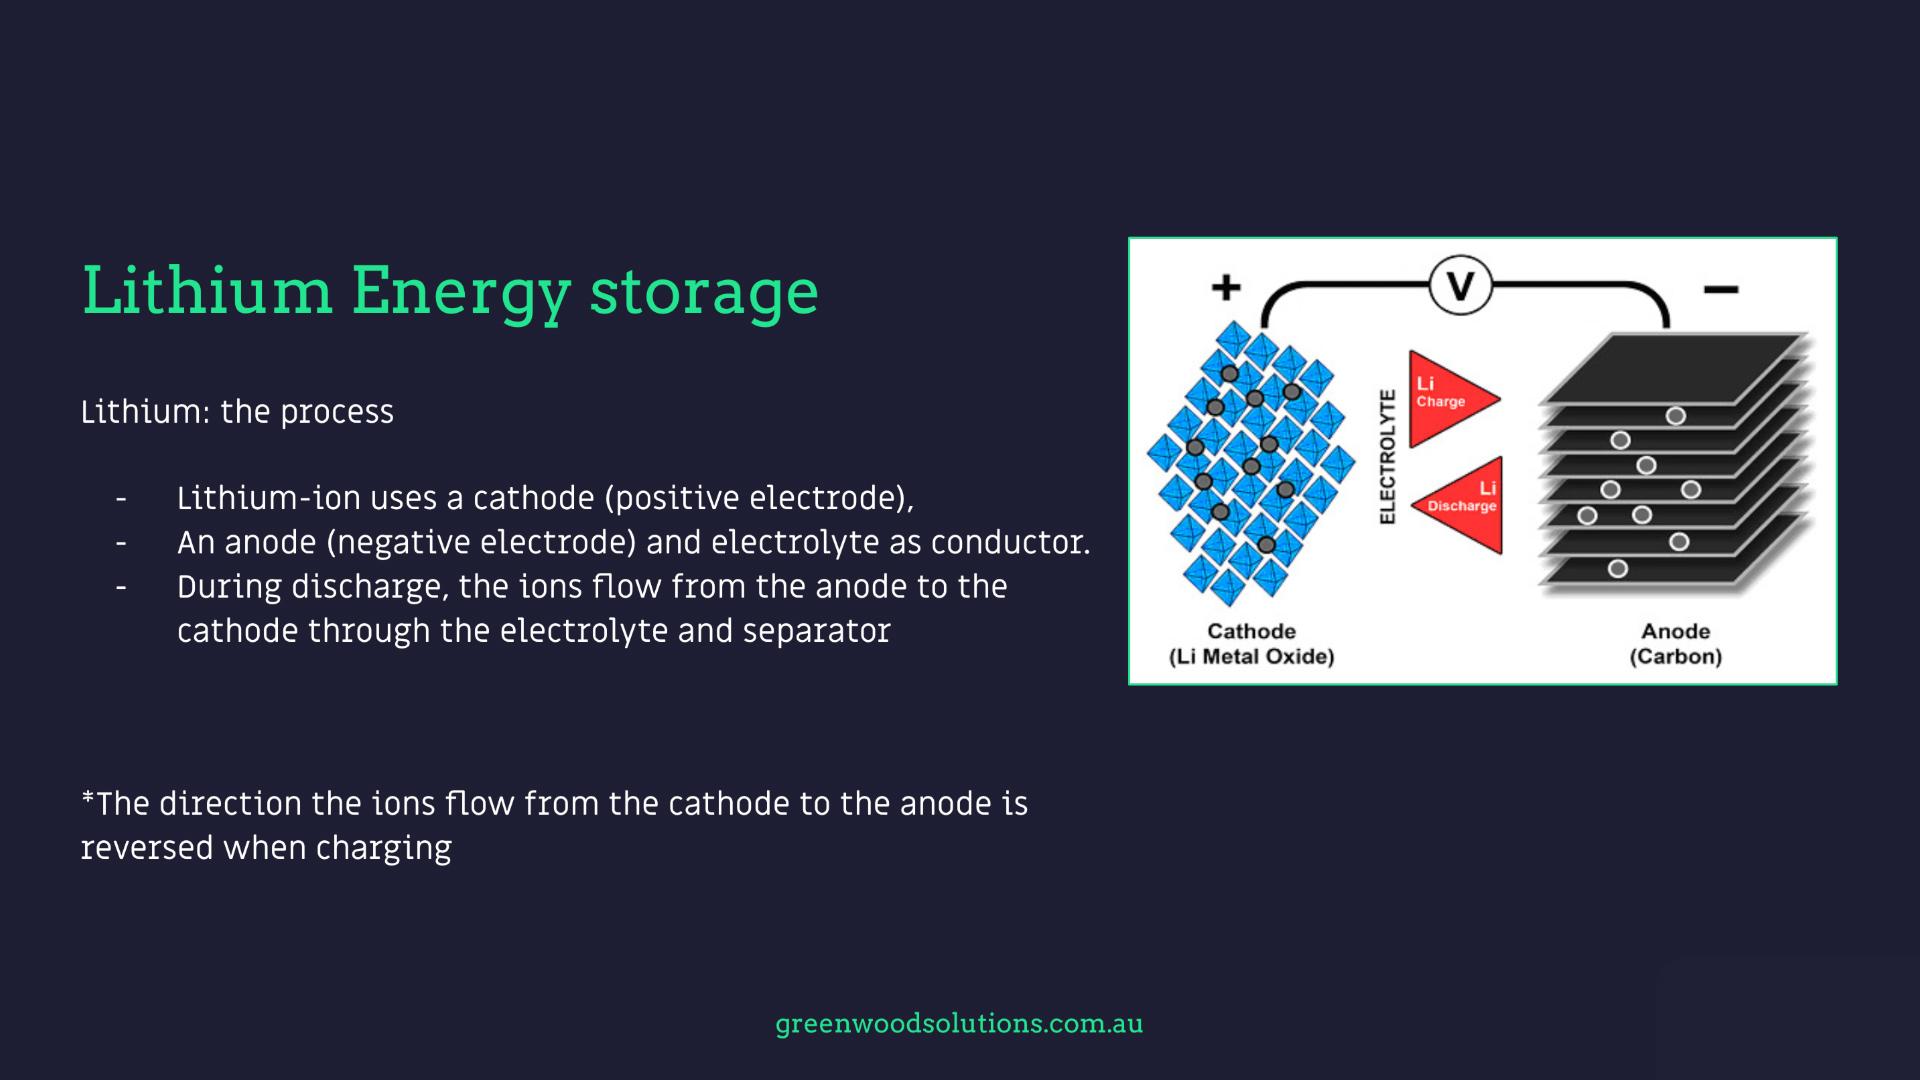 Lithium energy storage